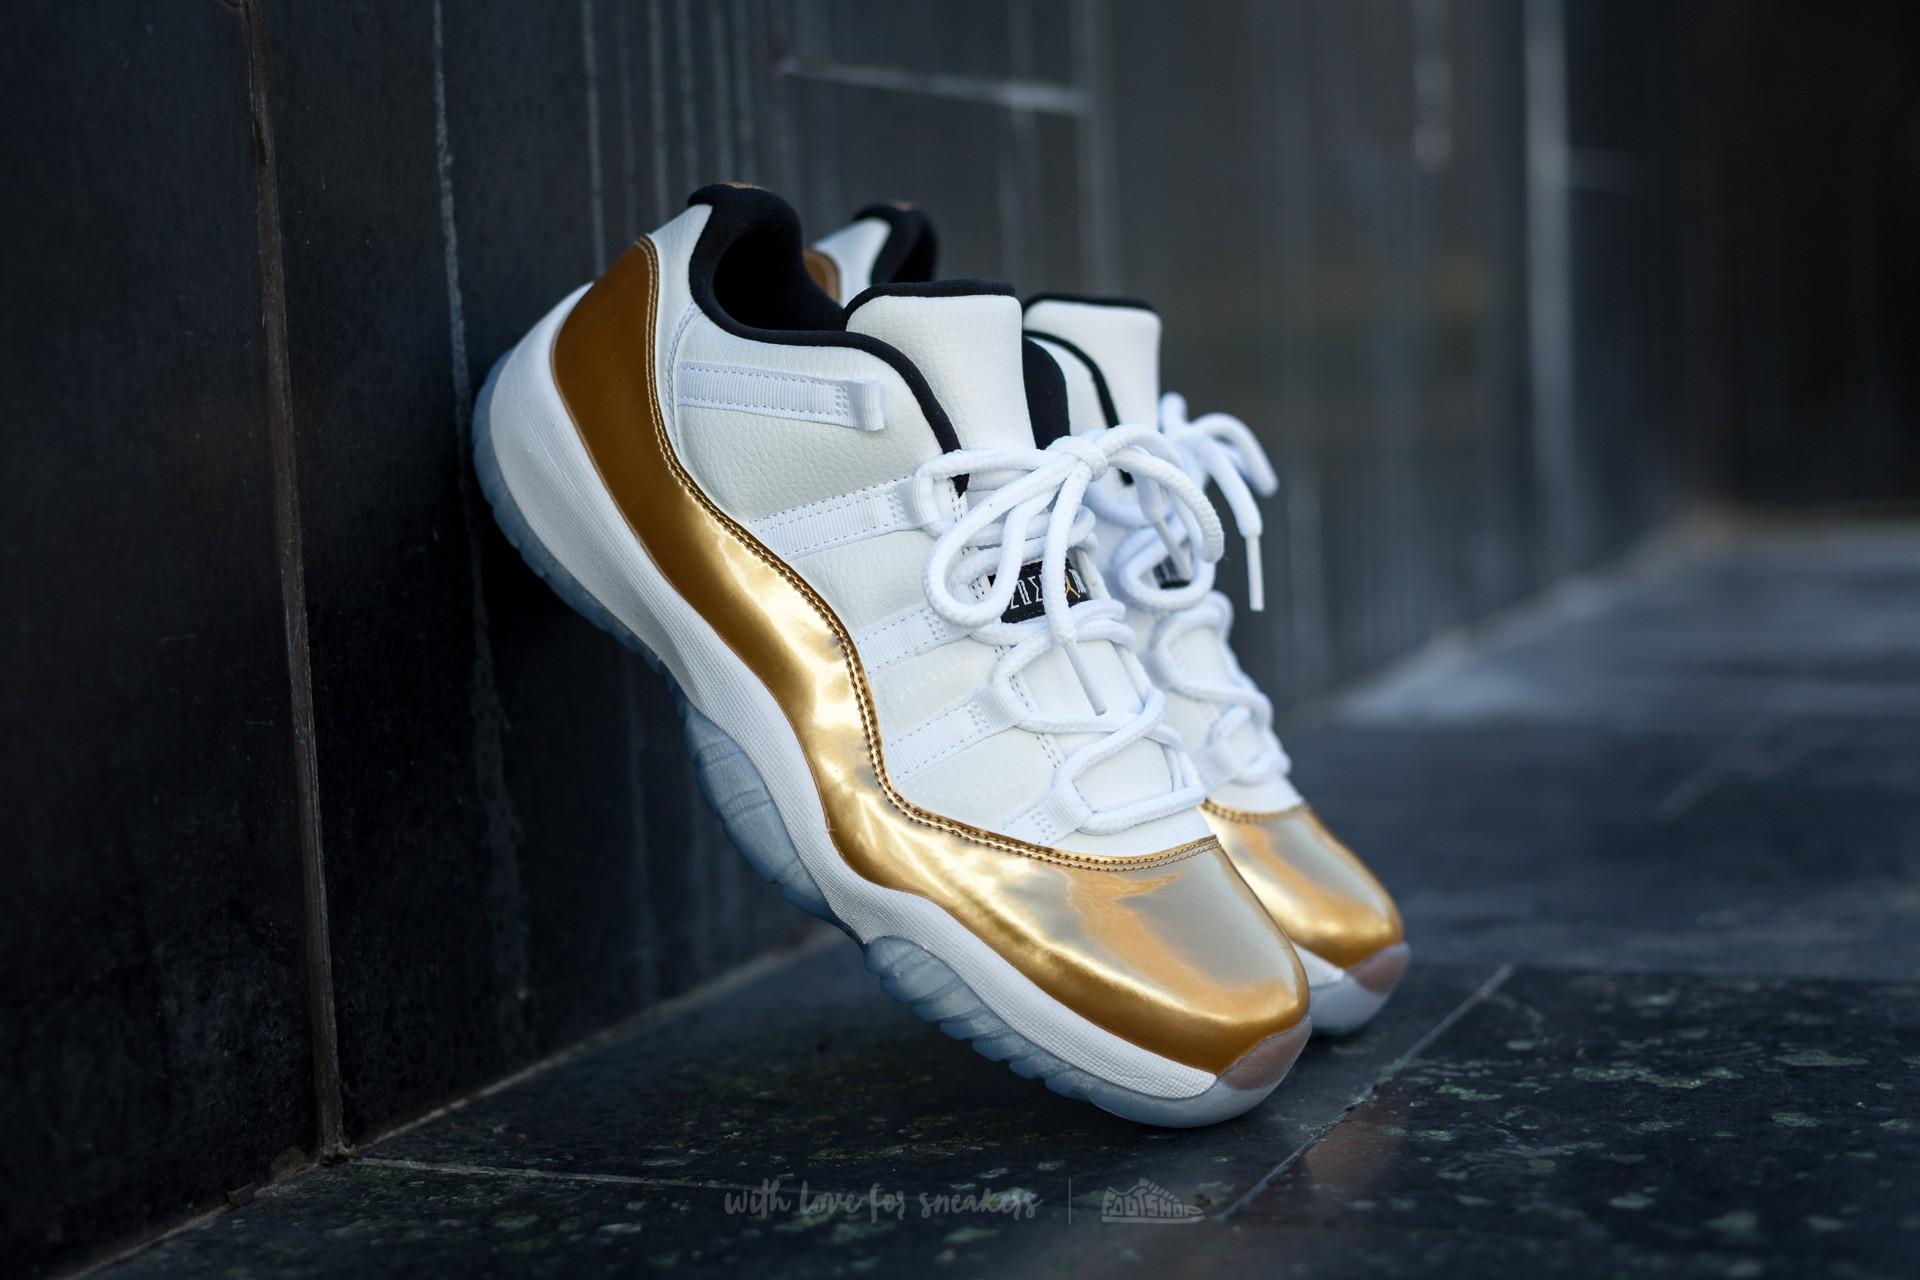 1f6ae76aaee392 Air Jordan 11 Retro Low White  Metallic Gold Coin-Black